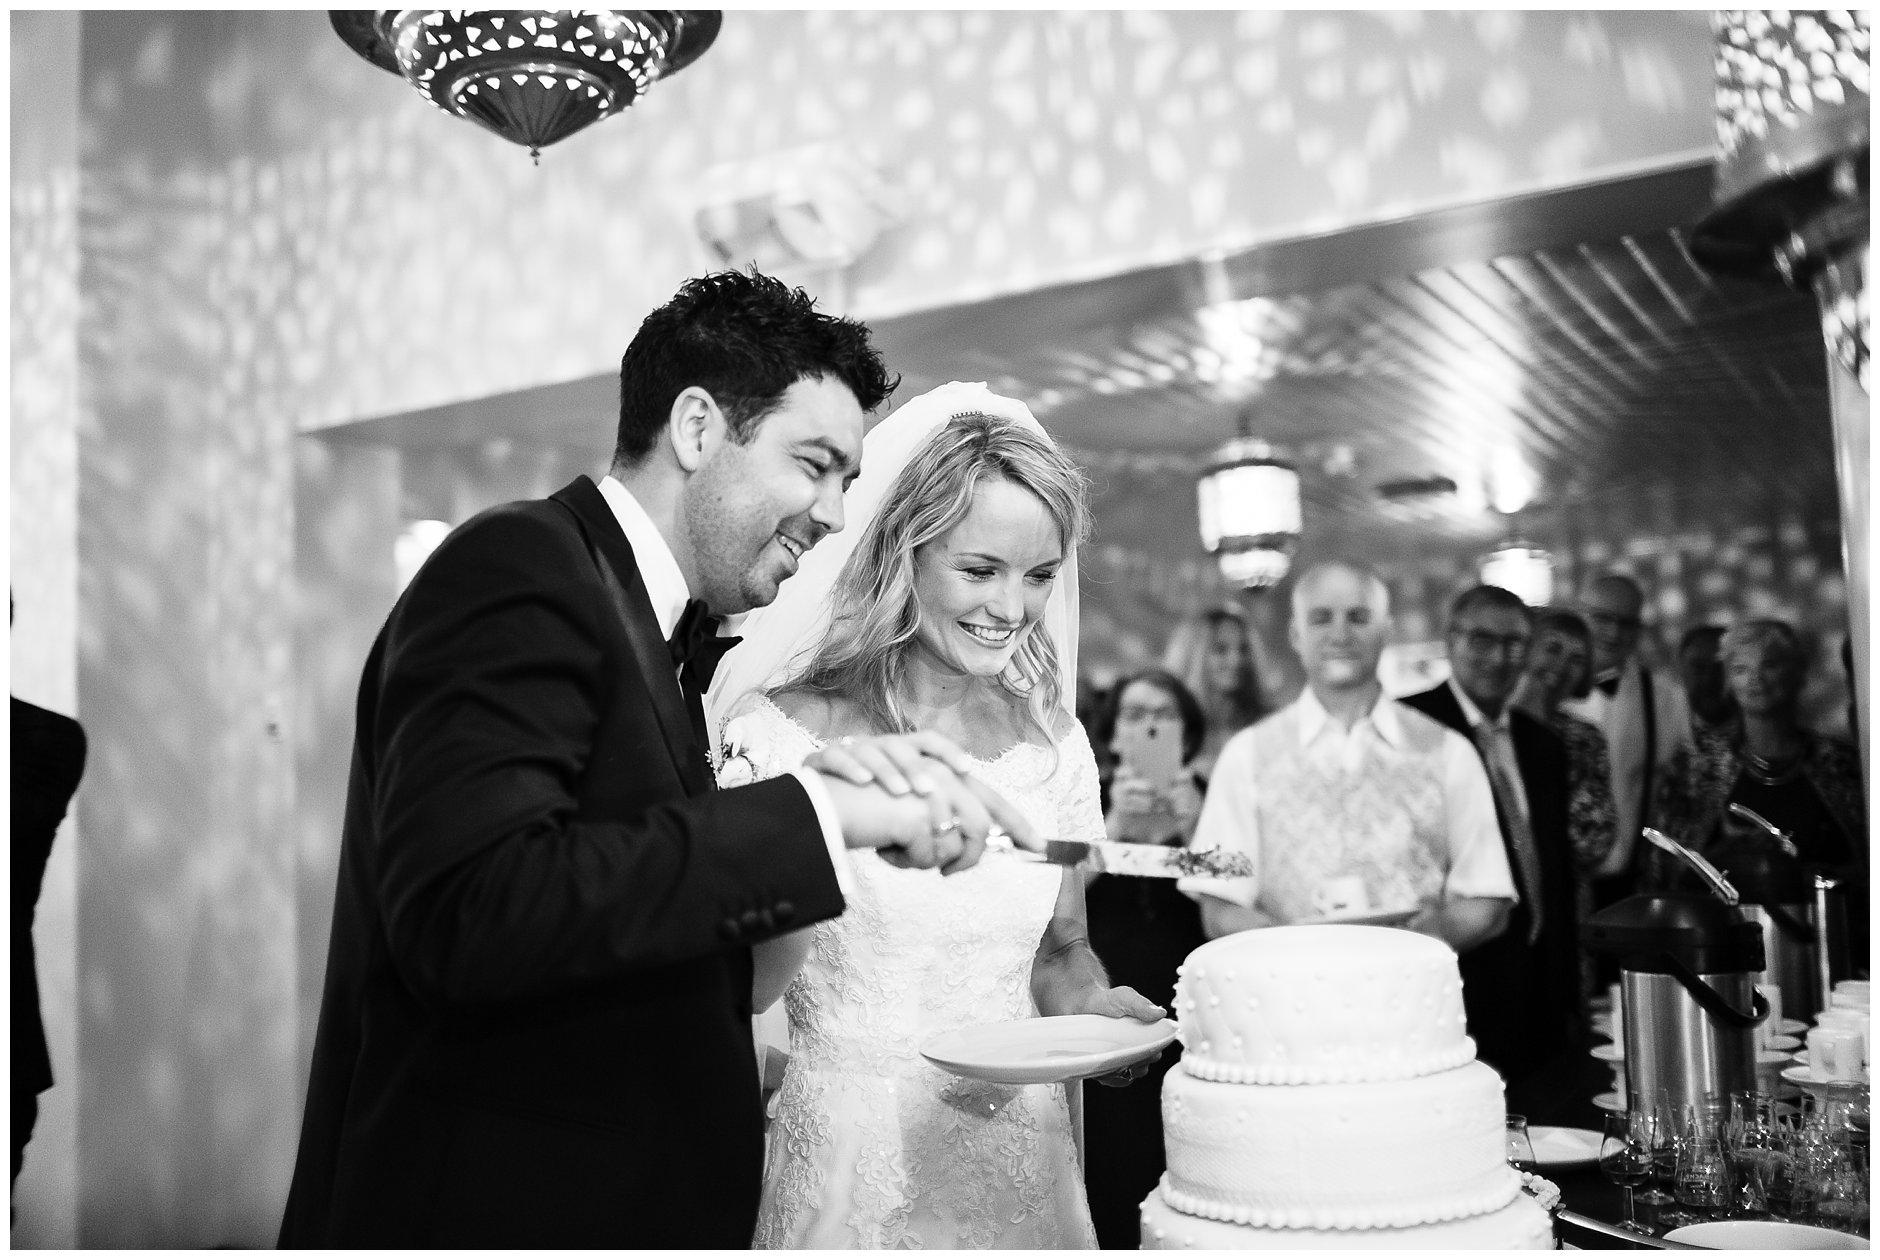 Bryllupsfest Villa Malla bilder